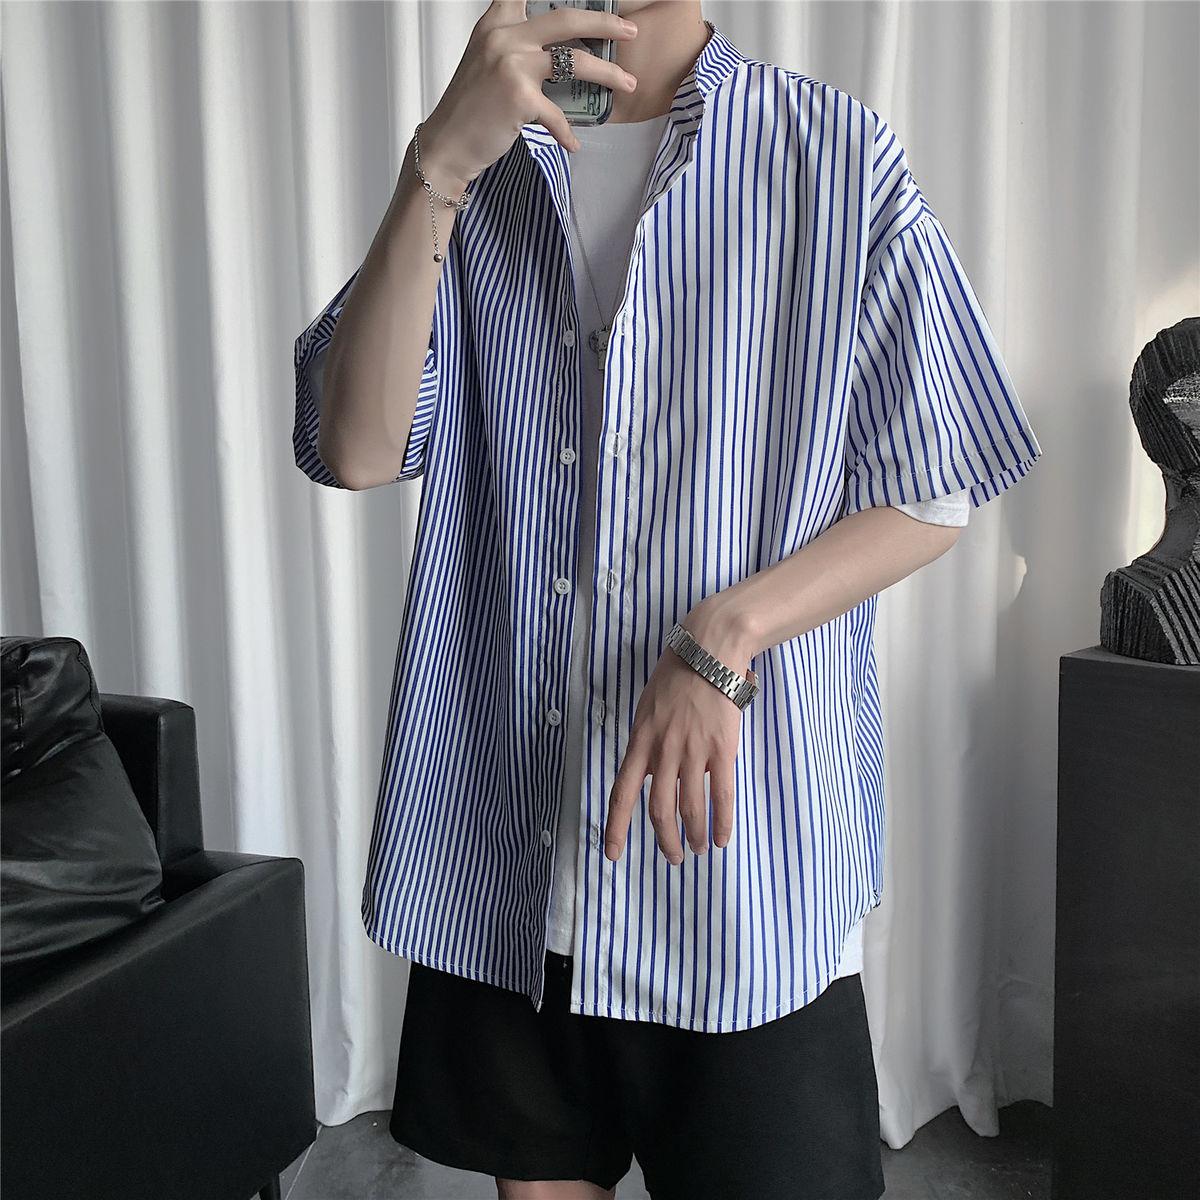 2020 Summer Men's Stripe Printing Splicing Color Shirt Loose Casual Cotton Clothes Shirt Blue/black Color Camisa Masculina M-5XL